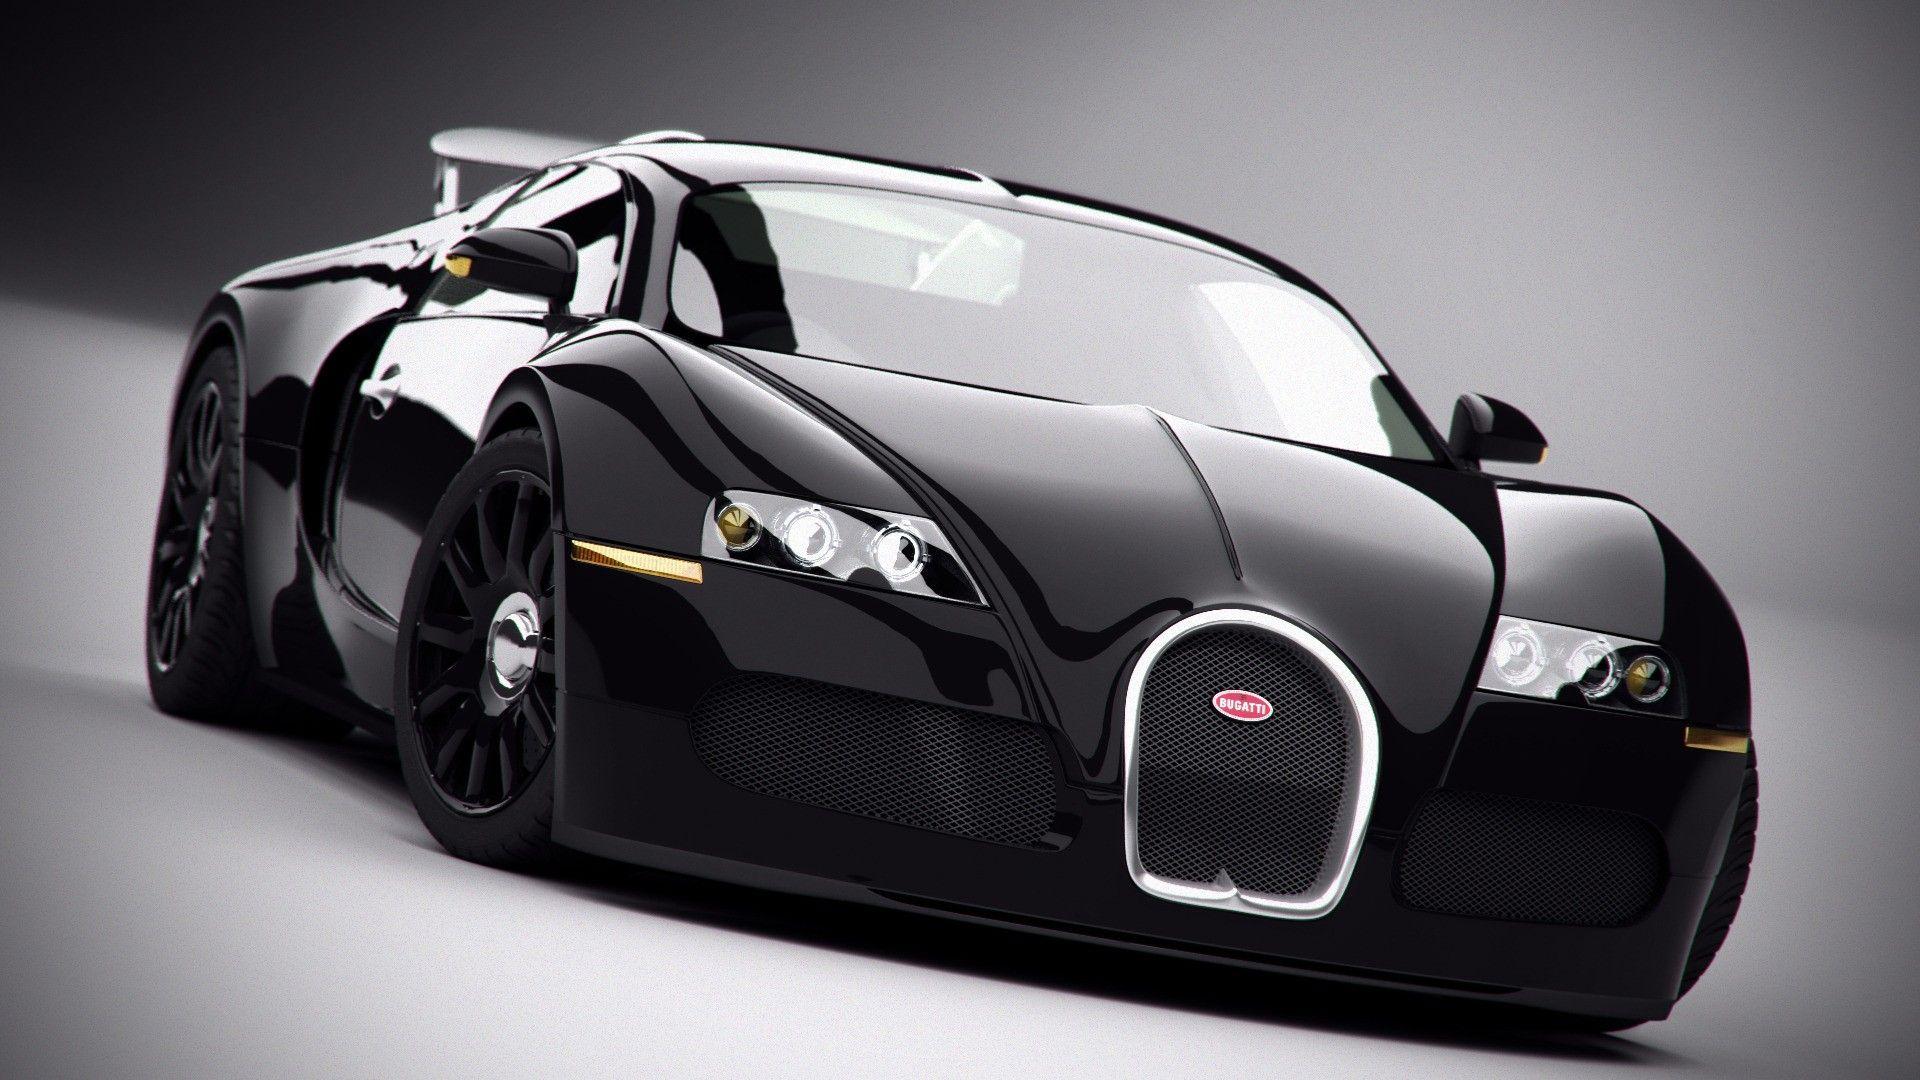 Cool Wallpapers Bugatti Veyron Bugatti Cars Bugatti Veyron Bugatti Veyron Black